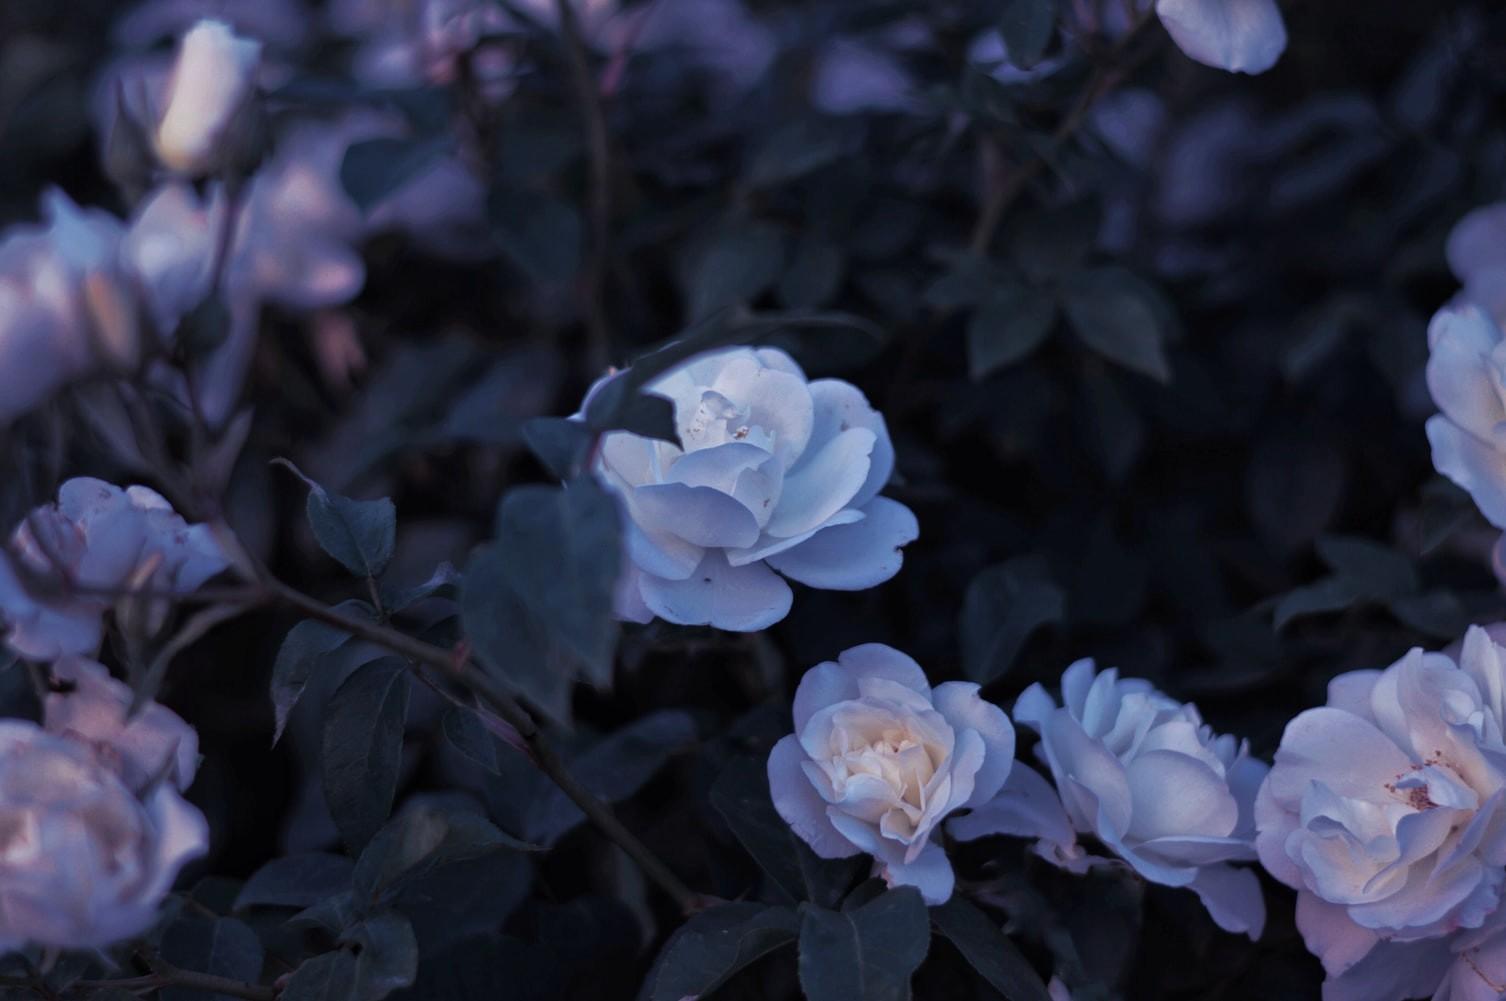 General 1506x1001 flowers roses floral plants garden